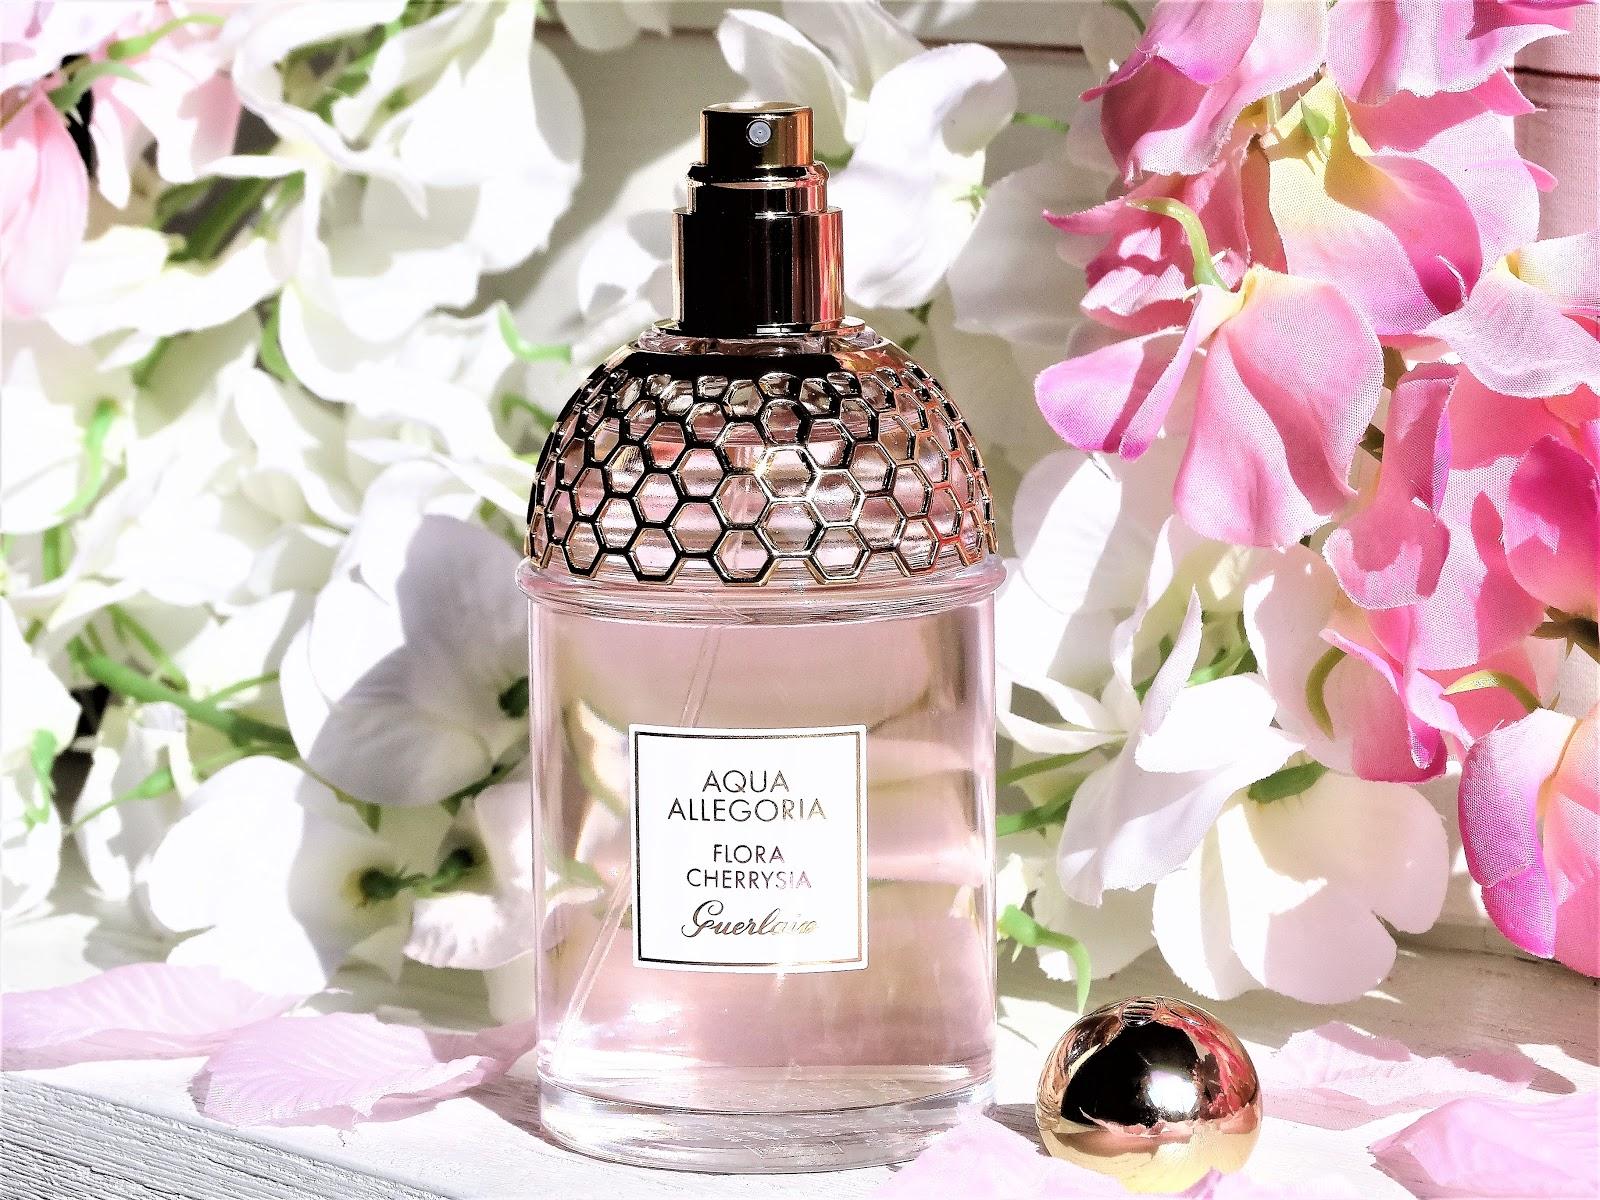 Aqua Allegoria Flora Cherrysia Le Nouveau Parfum Guerlain